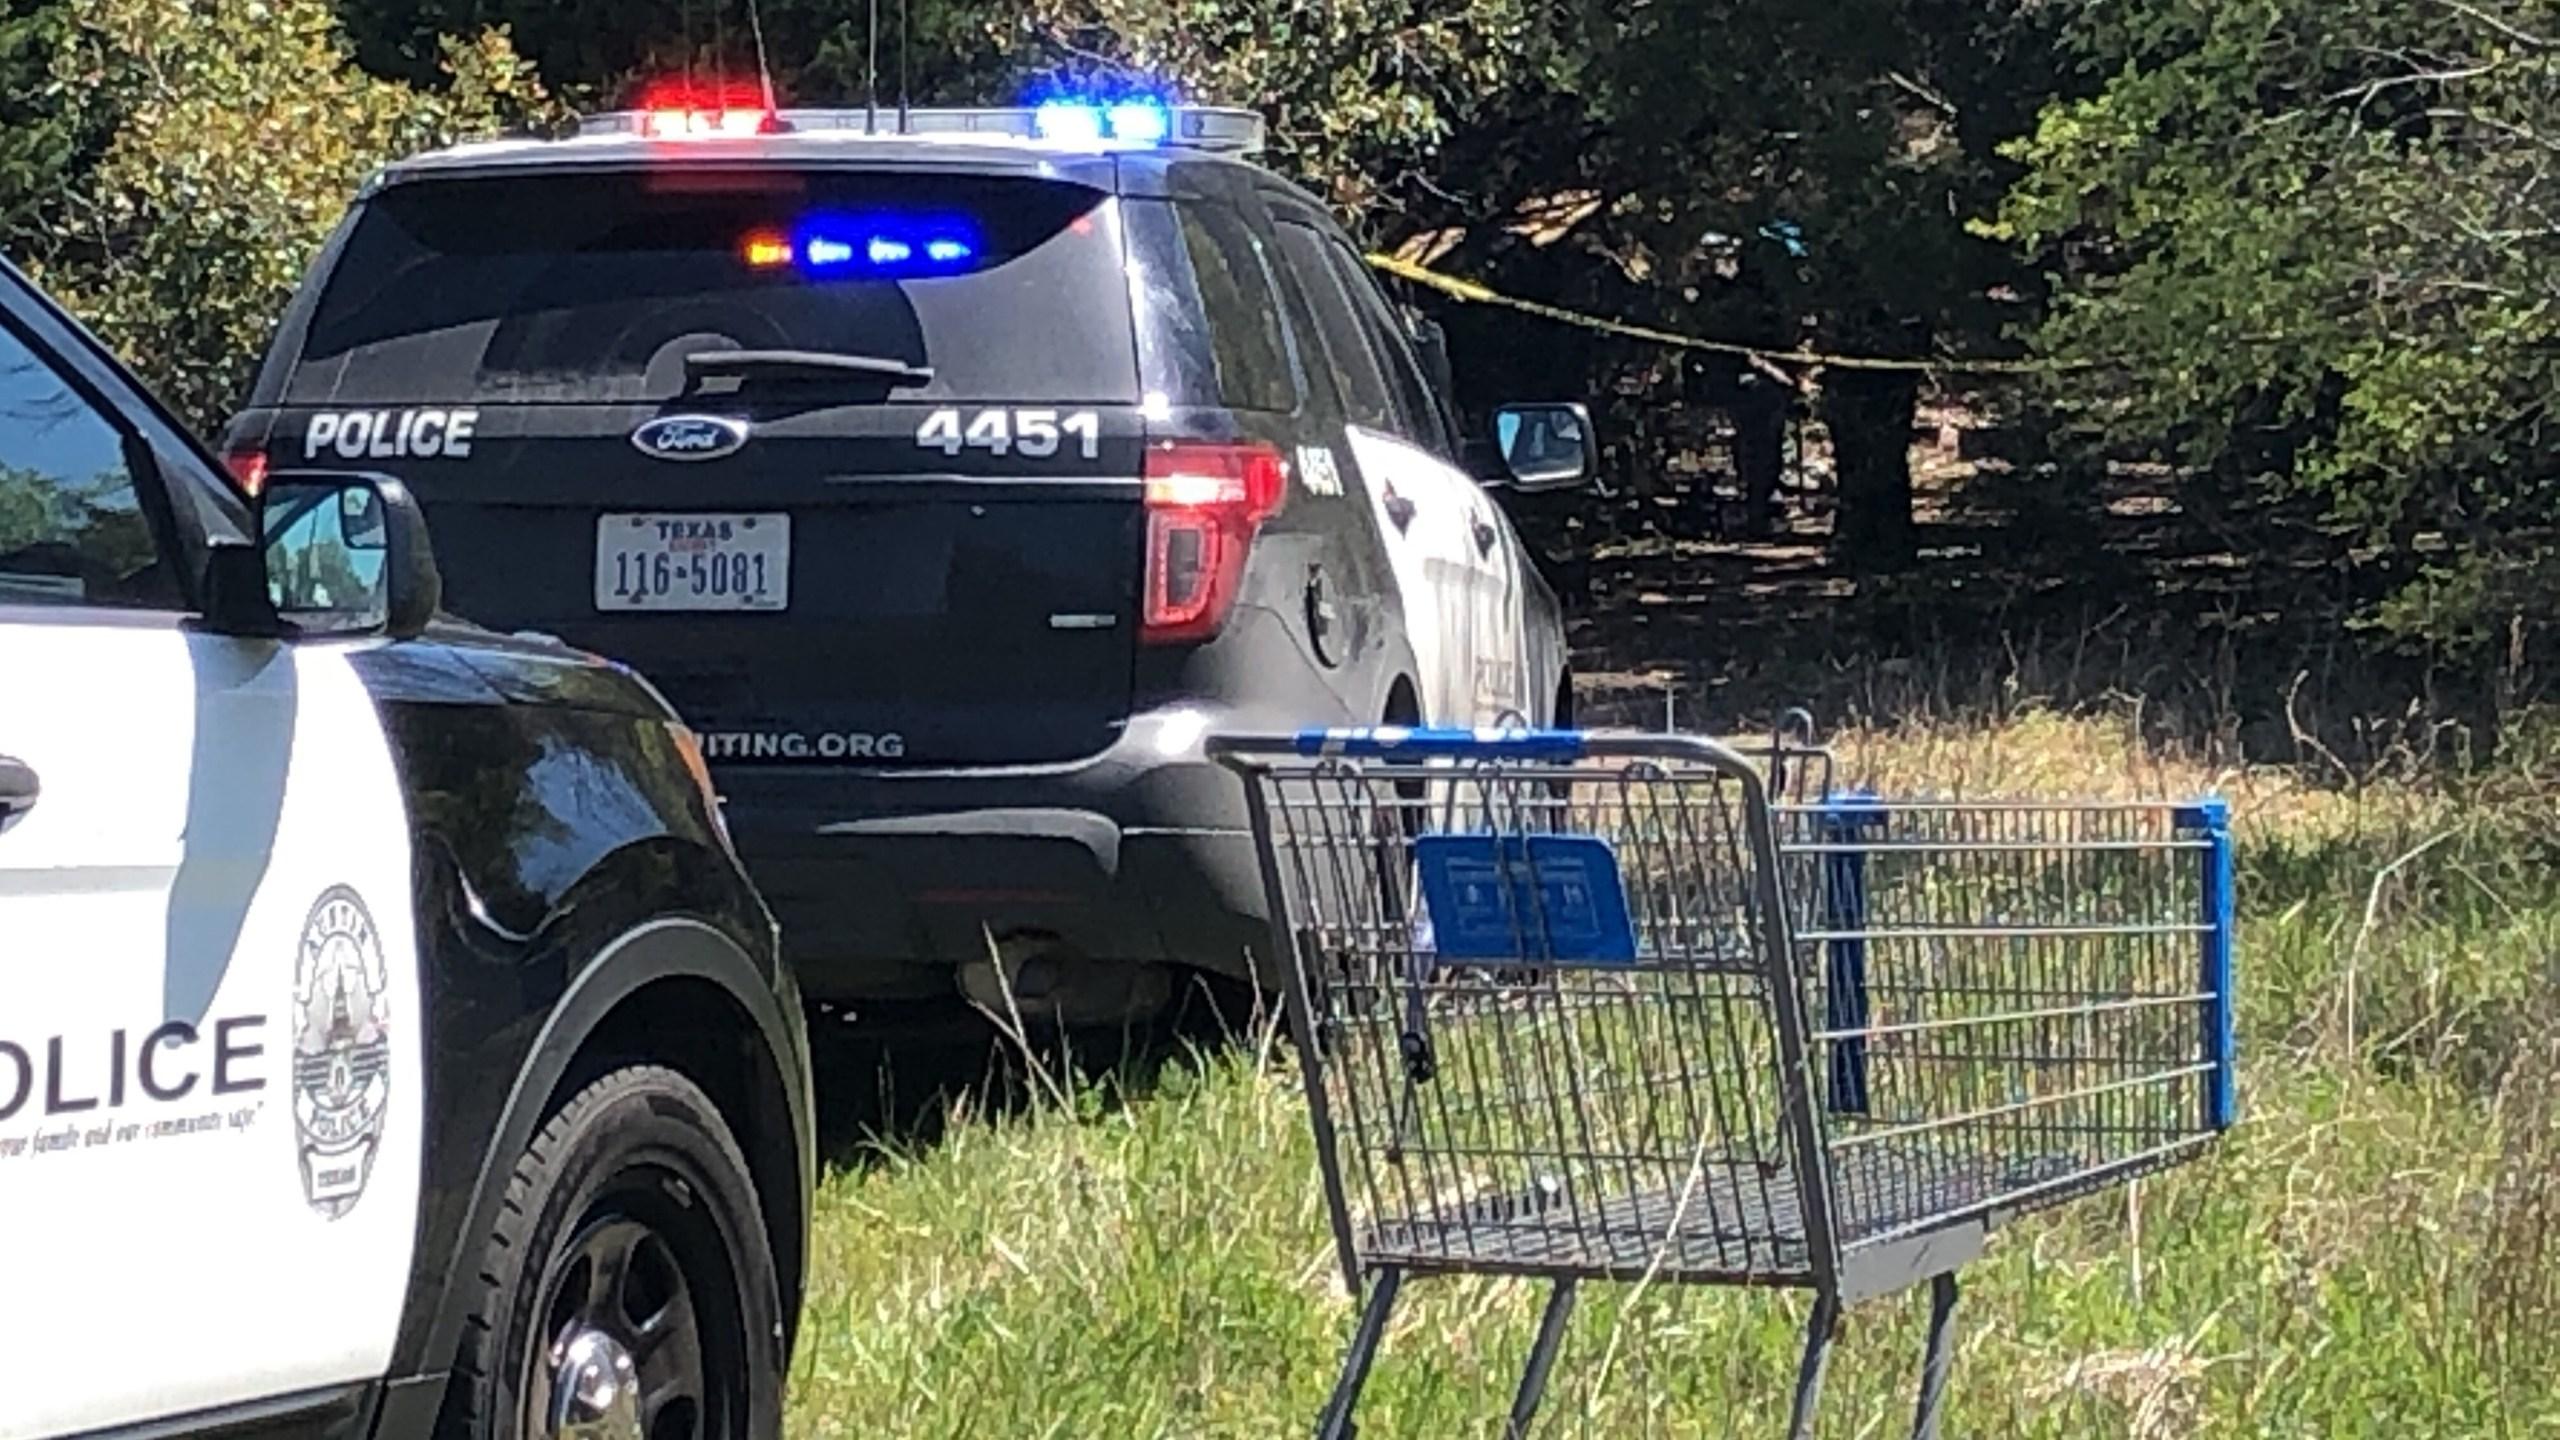 Police investigating dead body found in vacant field near